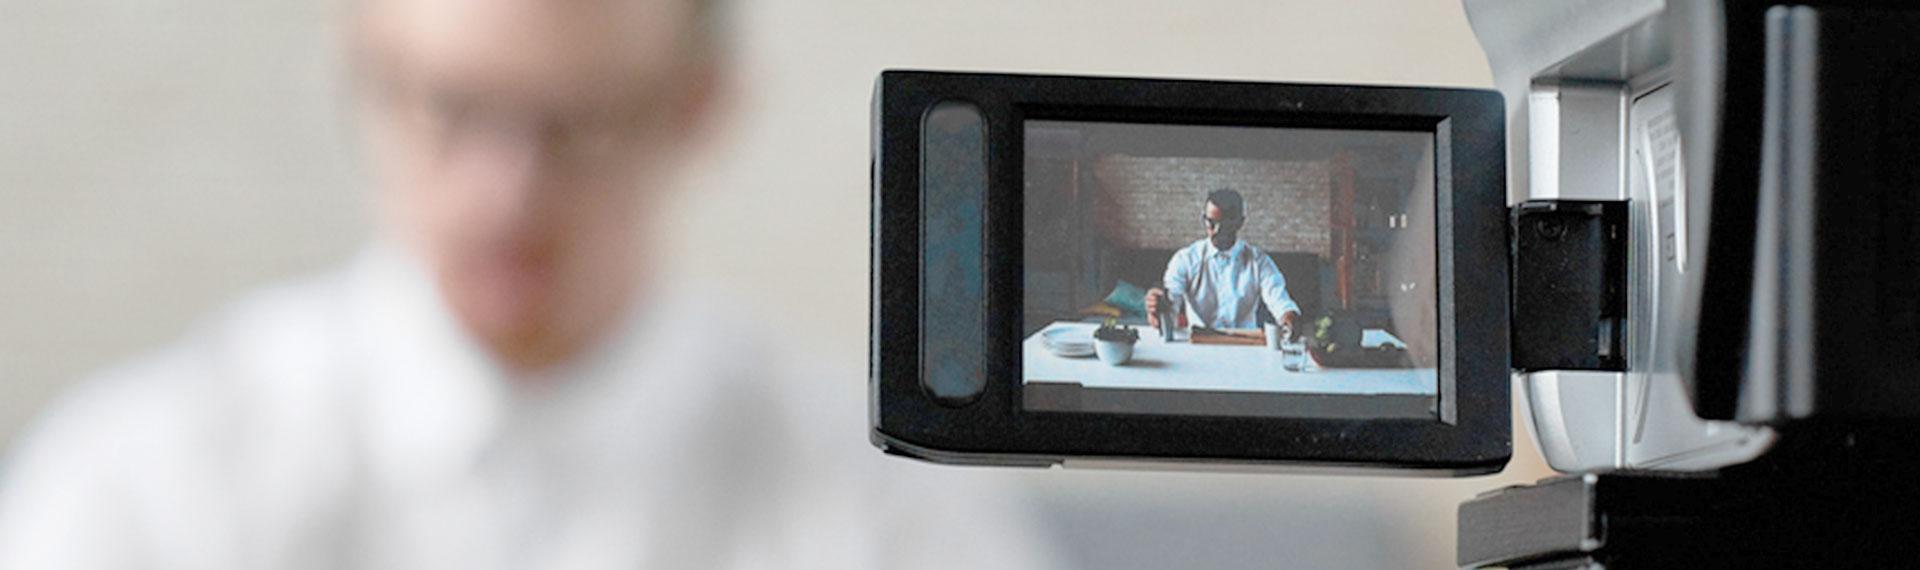 5 Kreativitas Bikin Konten Video Supaya Banyak Followers